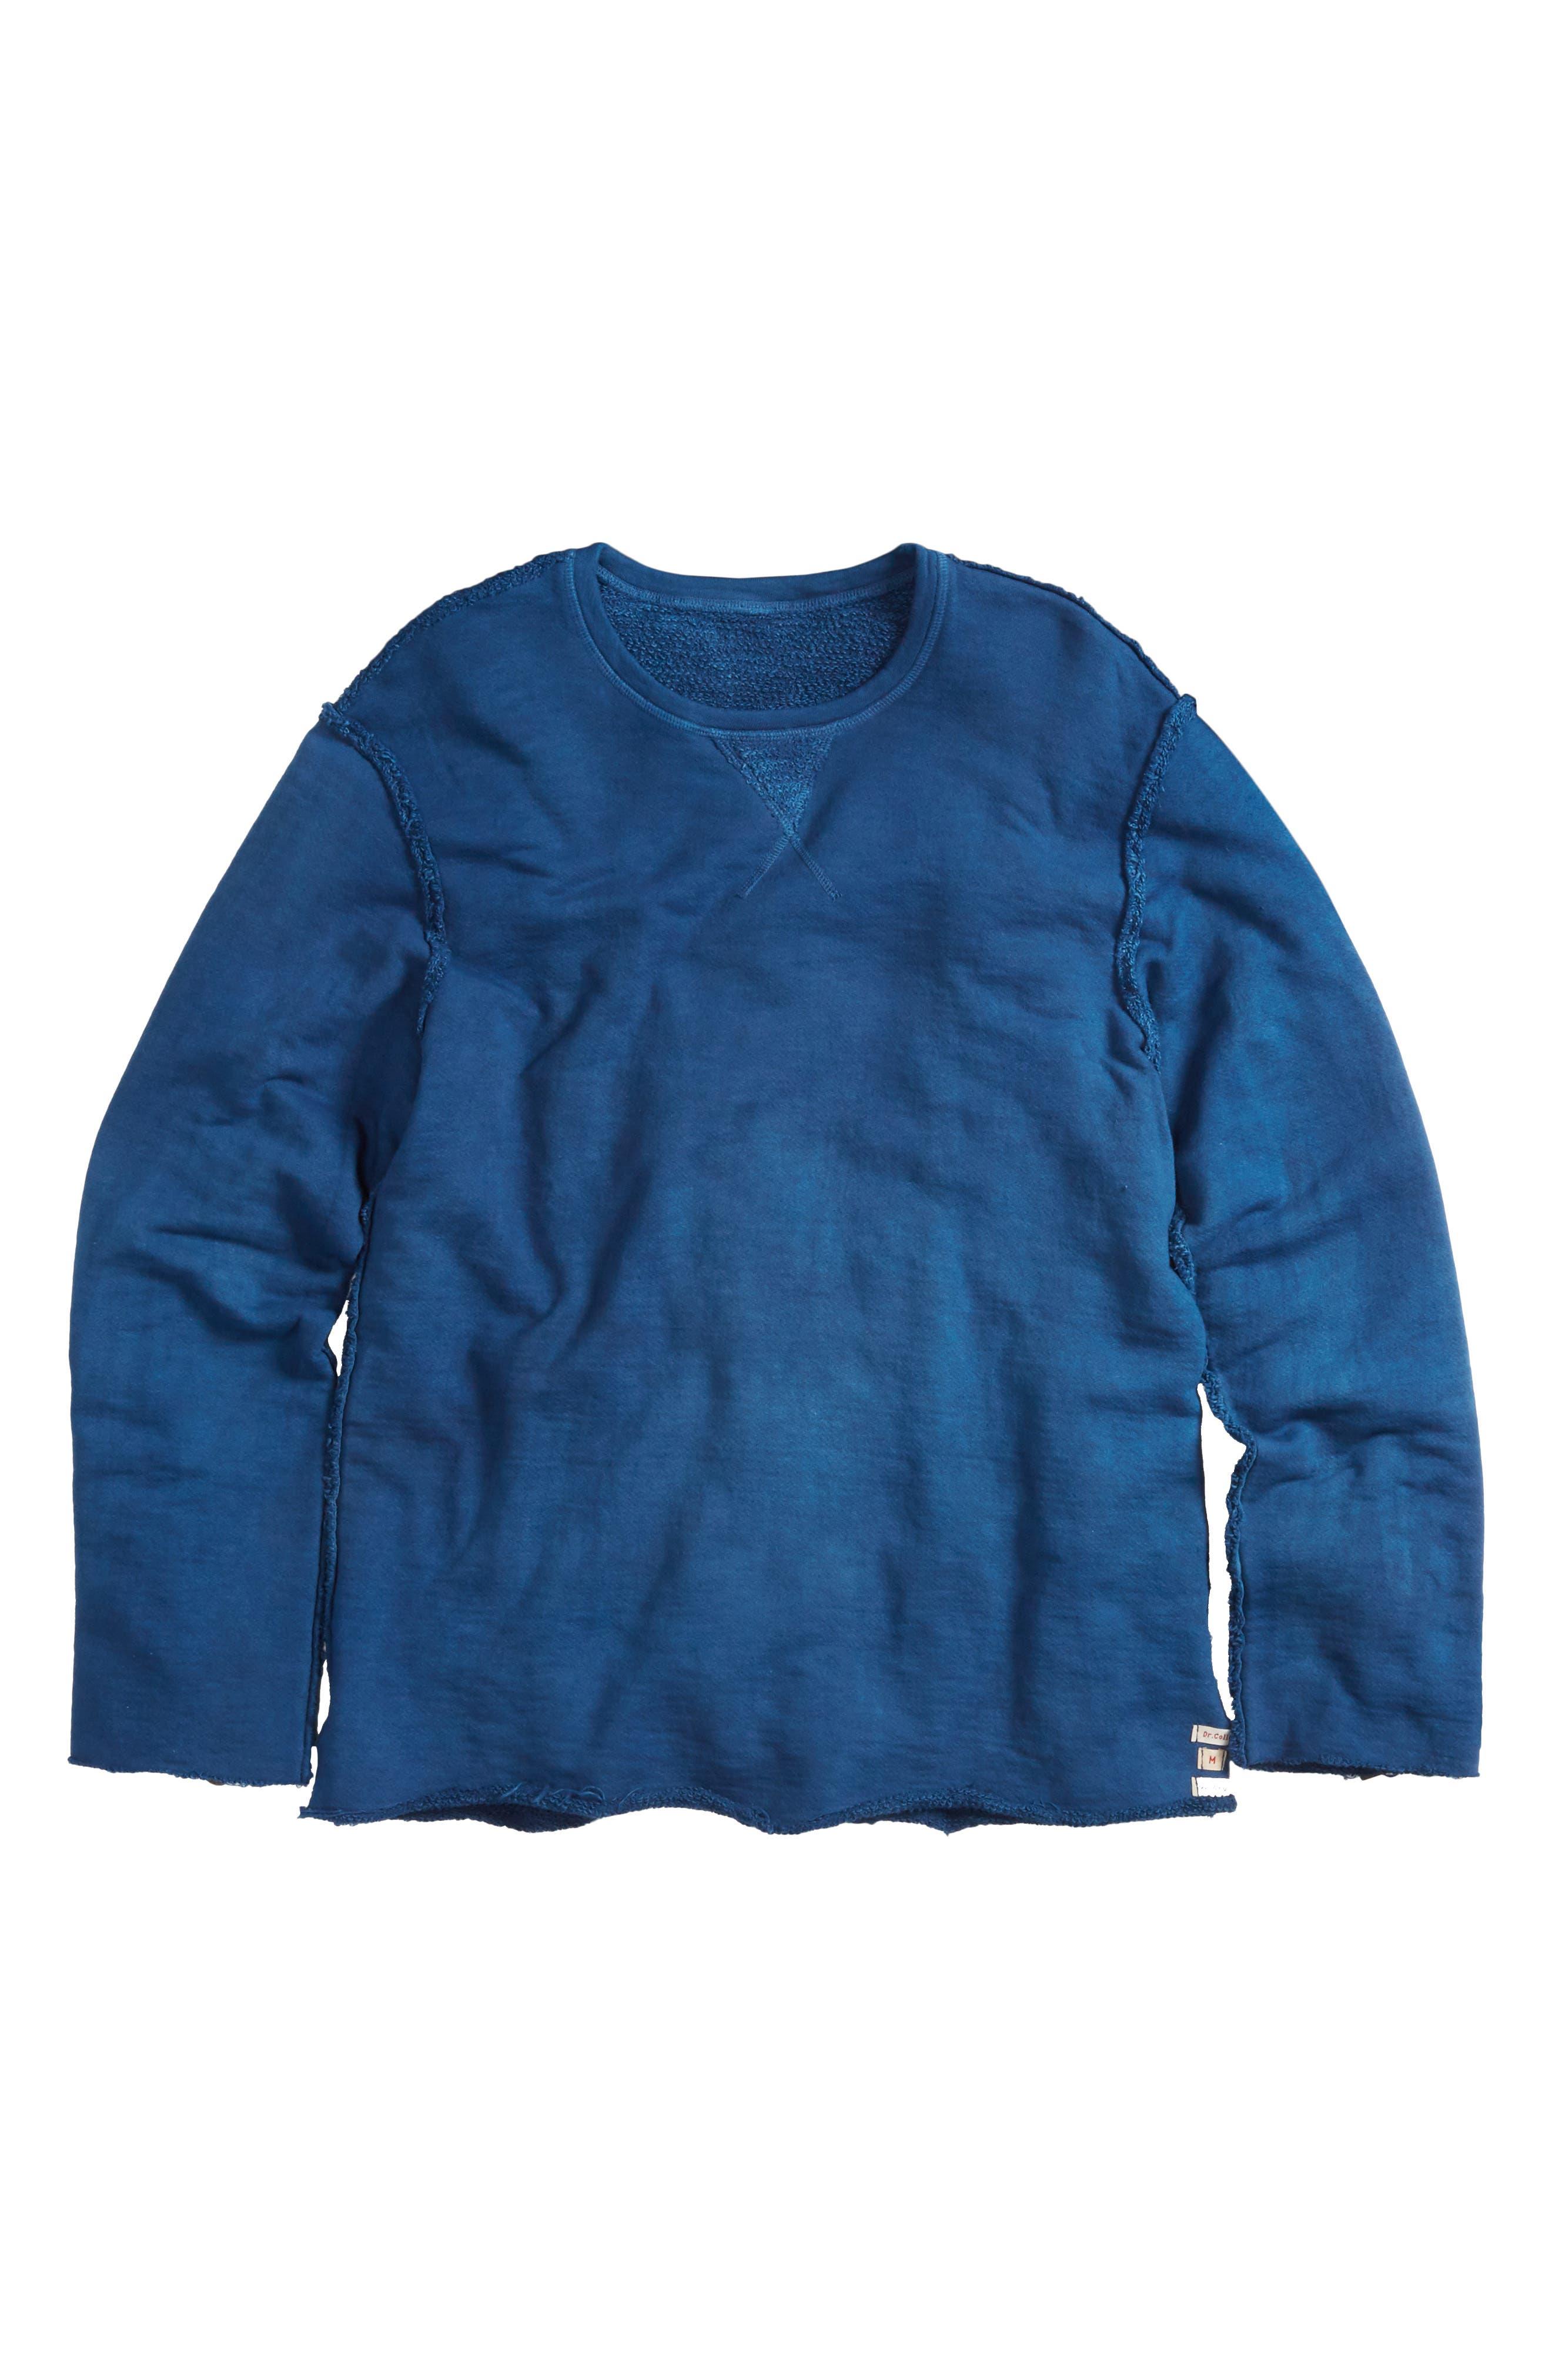 Main Image - Dr. Collectors Malibu Reversible Sweatshirt